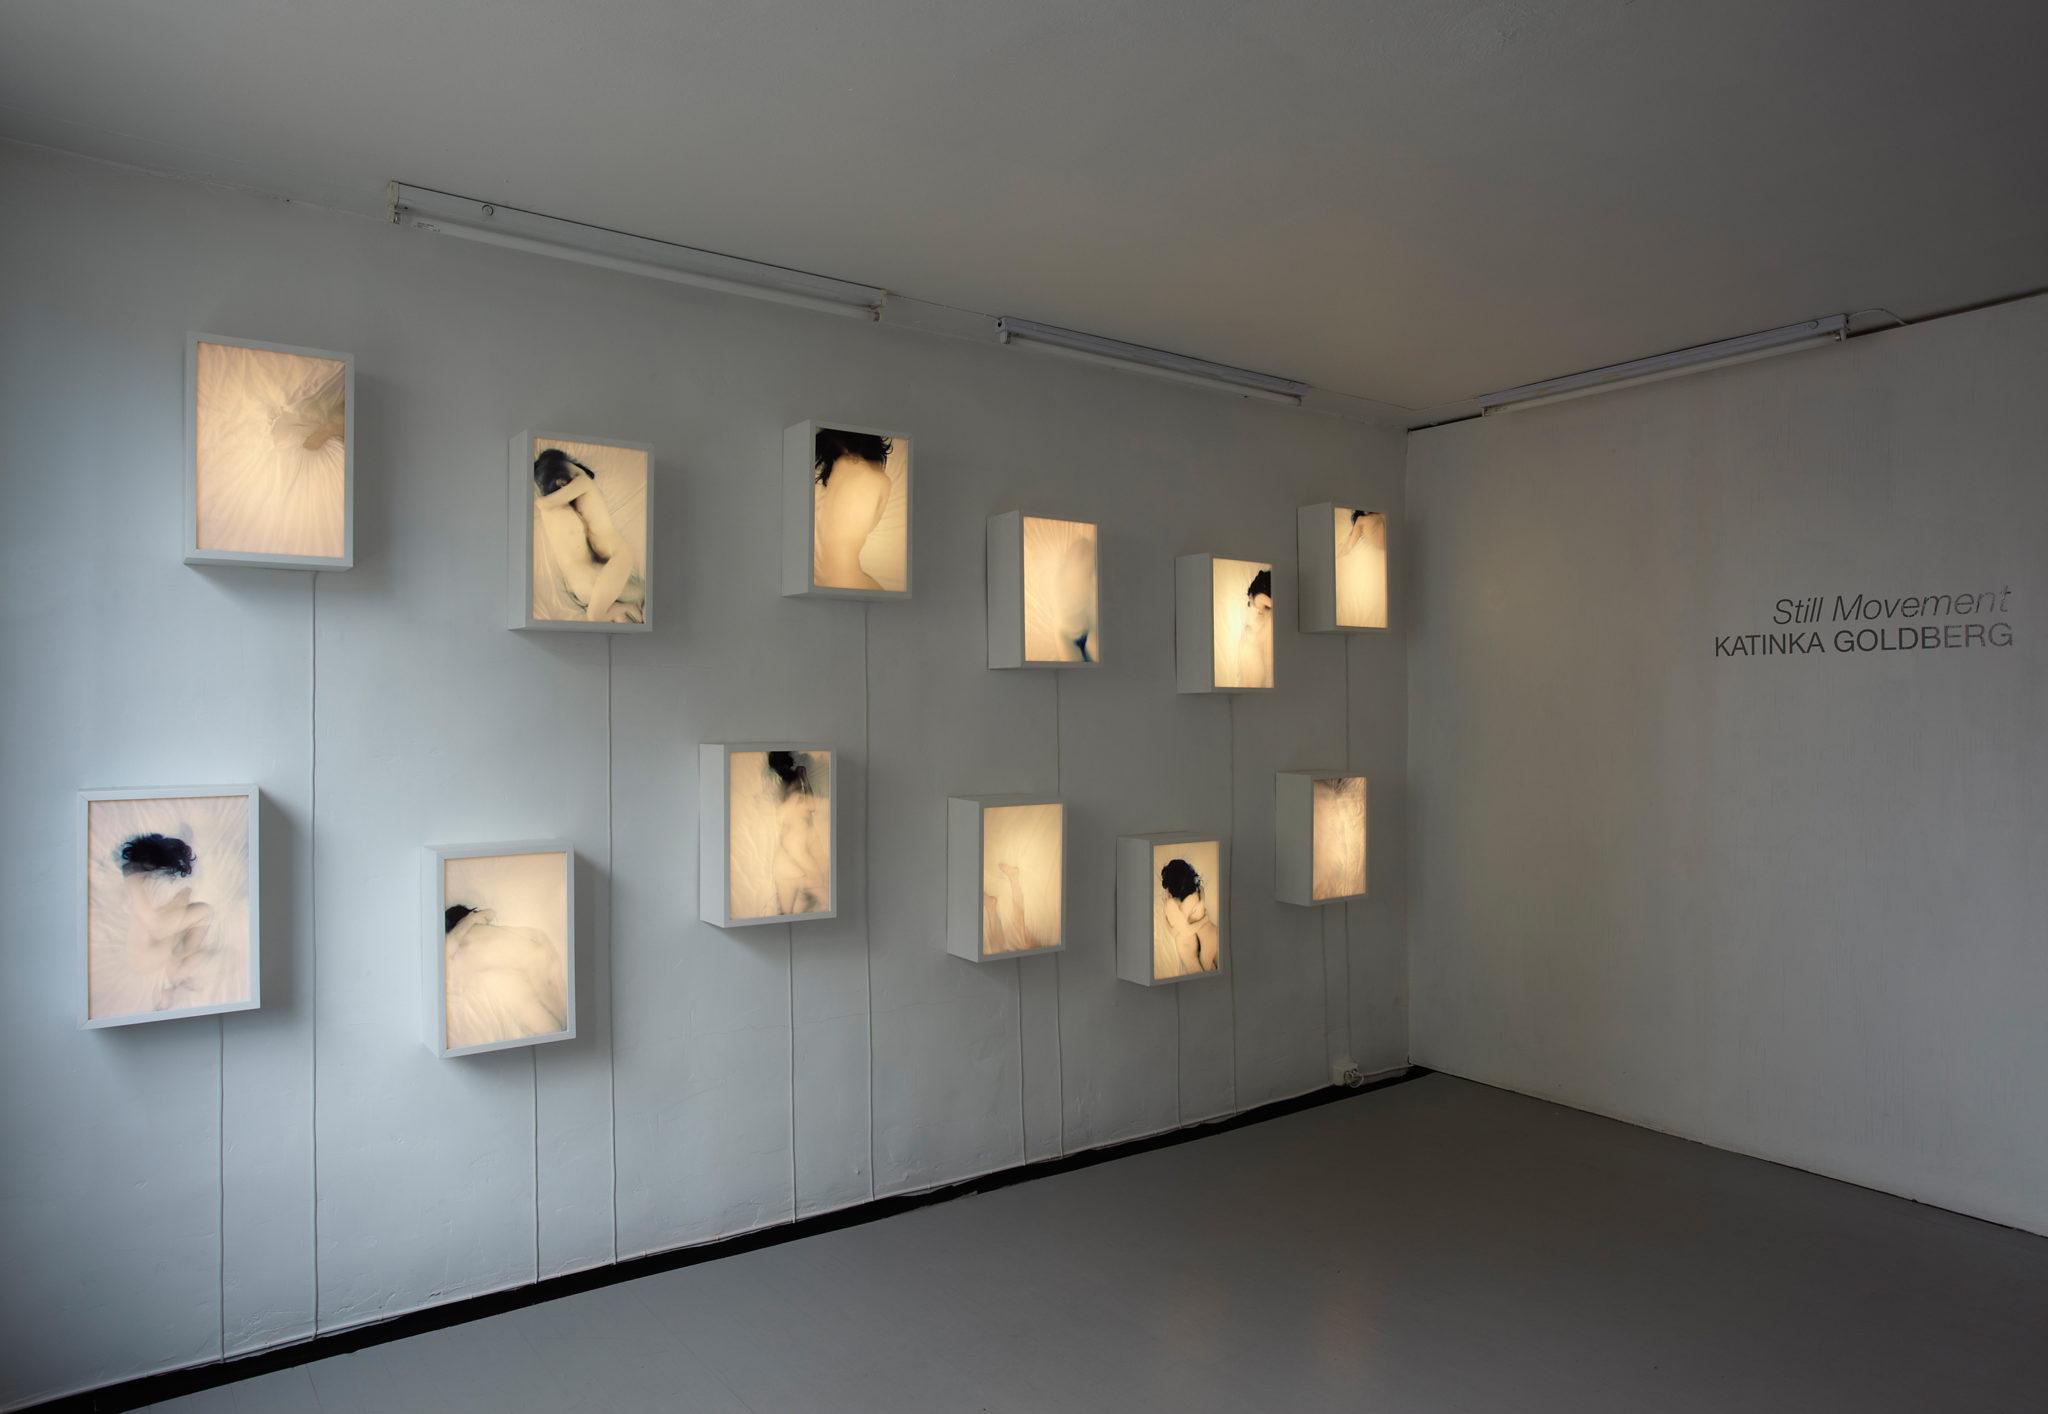 Katinka Goldberg - Still Movement at MELK